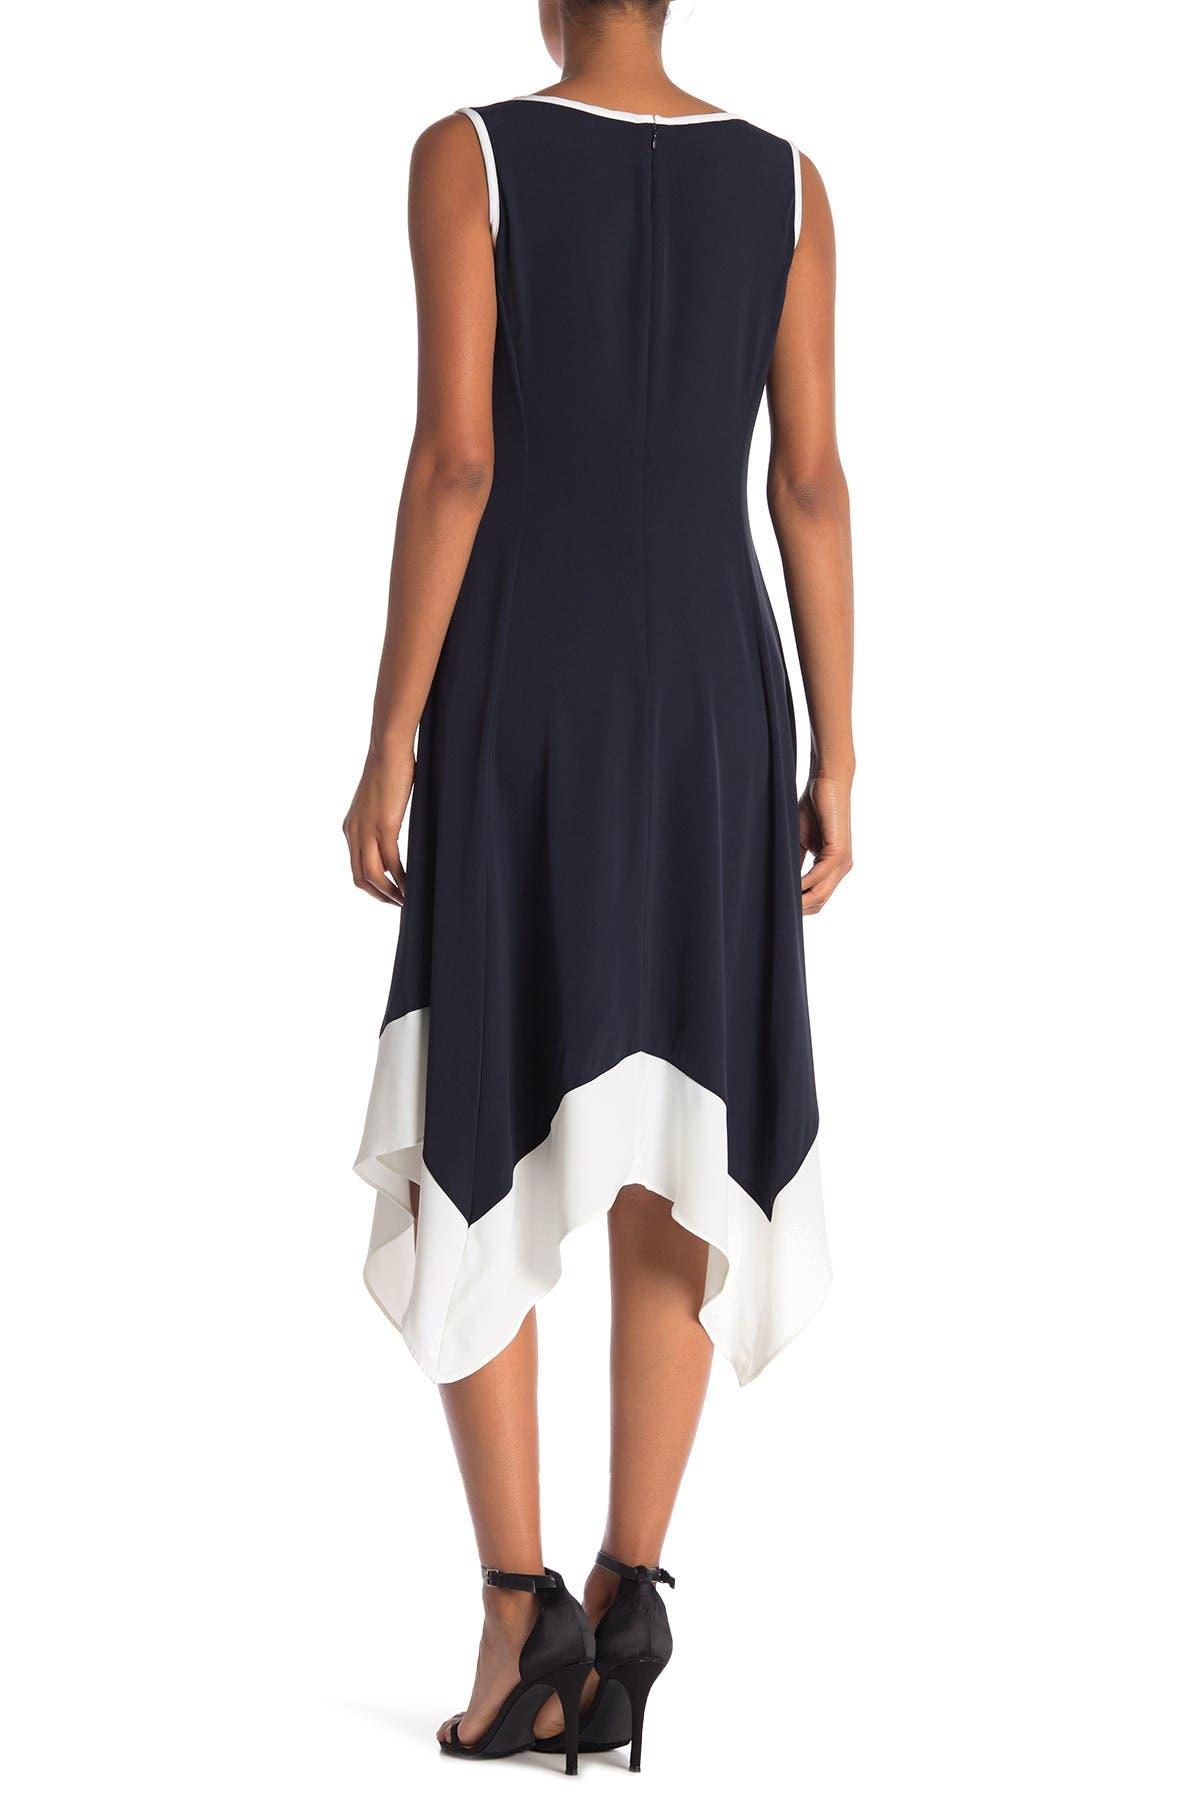 Image of Jones New York Sleeveless Handkerchief Hem Trimmed Dress